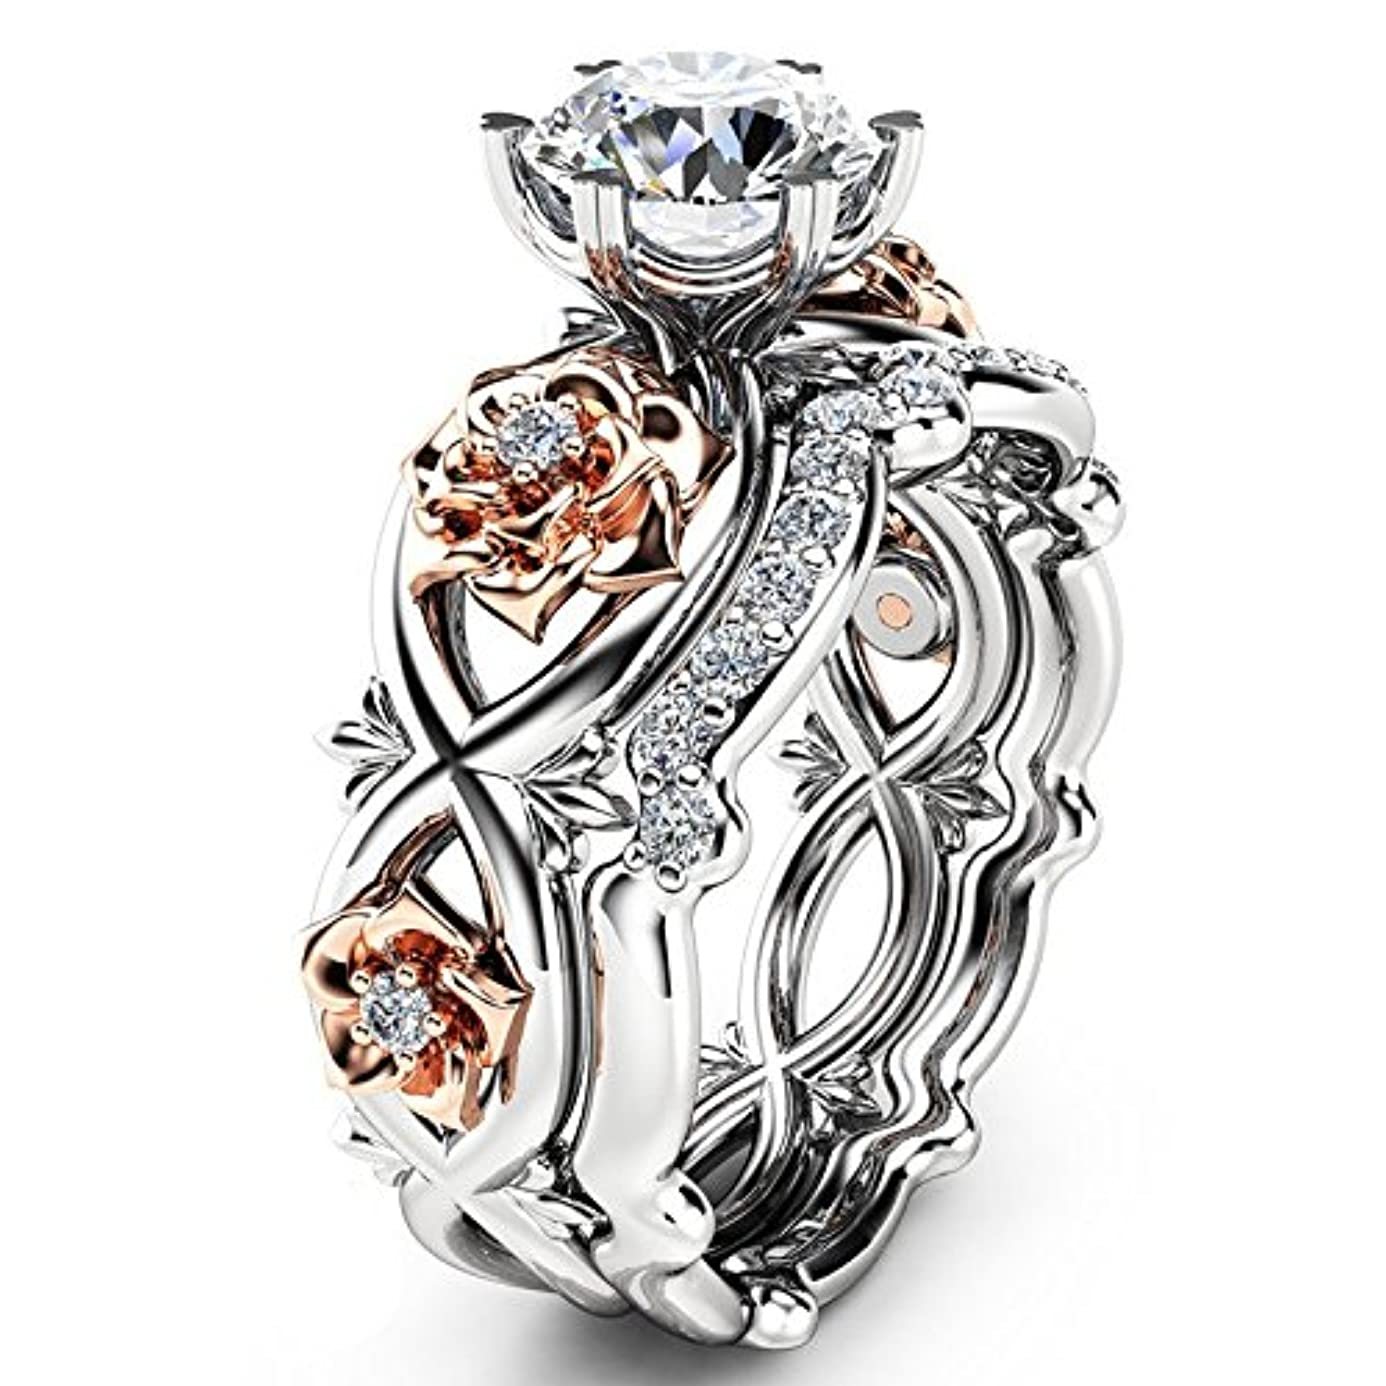 Kintaz Women's Engagement Wedding Ring European and American Fashion Luxury Simulation Green Diamonds Jewelry (7, Silver-Flower)